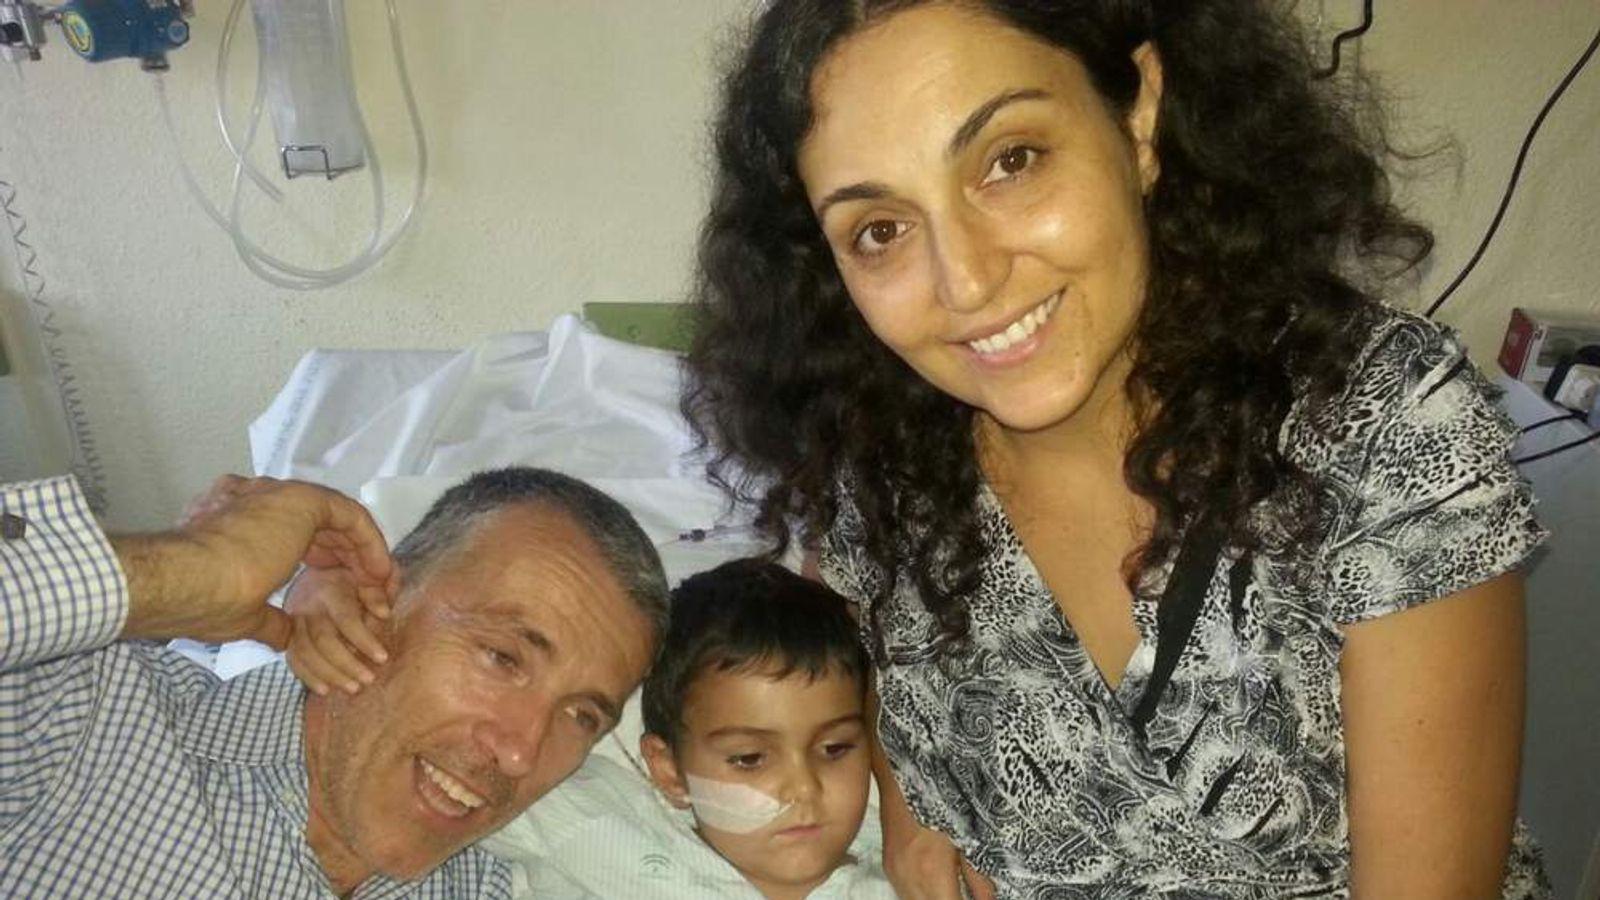 Ashya King with parents Brett and Naghemeh King